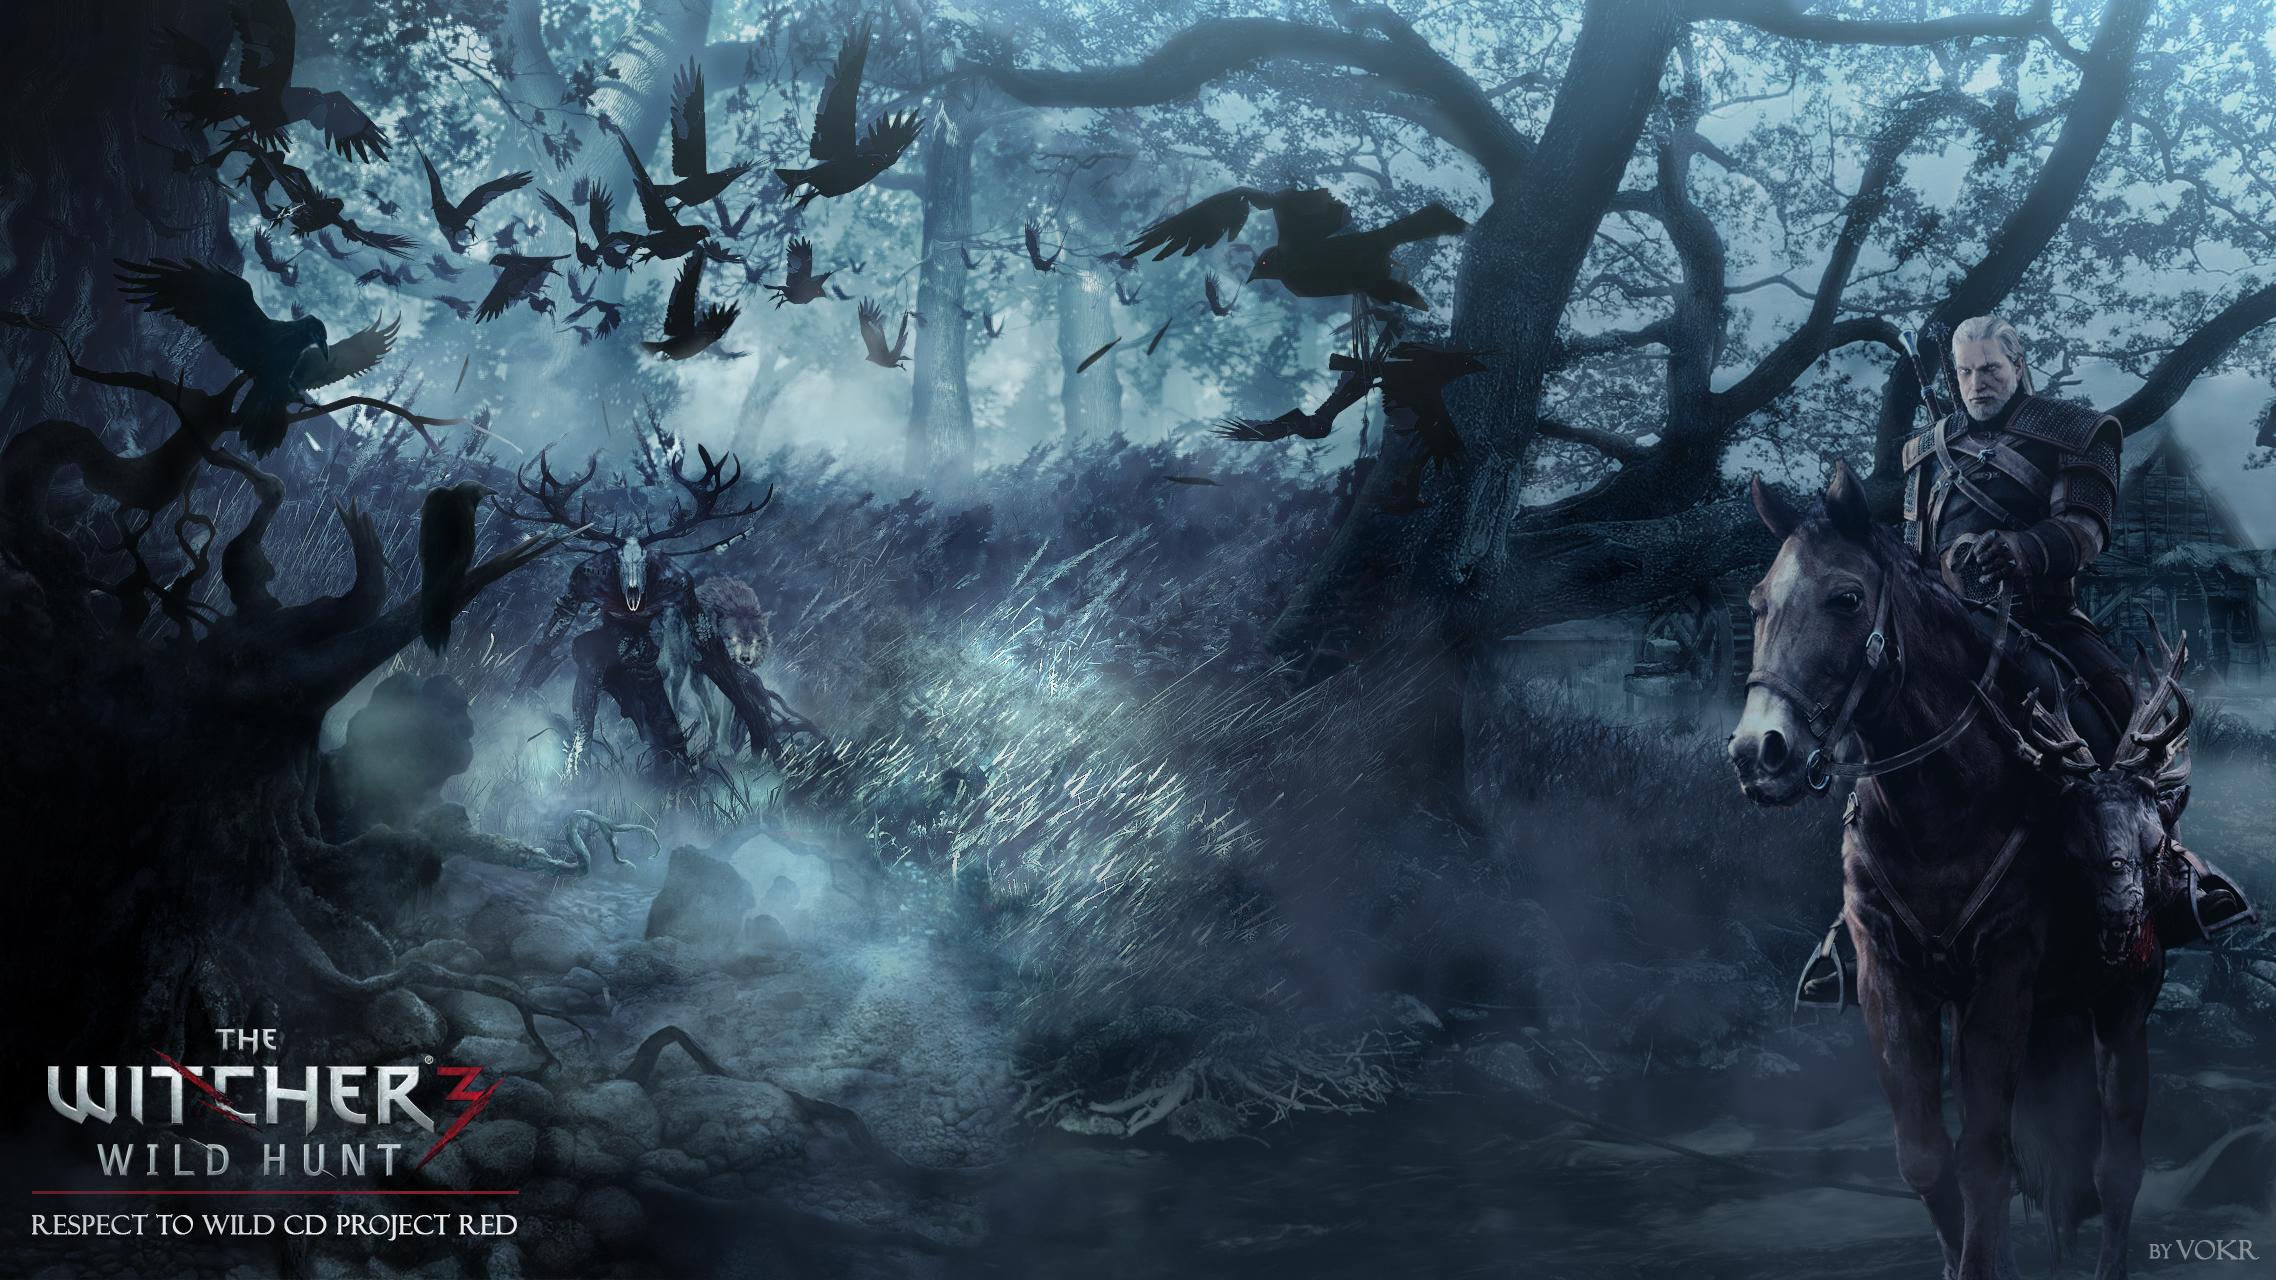 The Witcher 3 Wild Hunt Wallpaper By Vokr On Deviantart